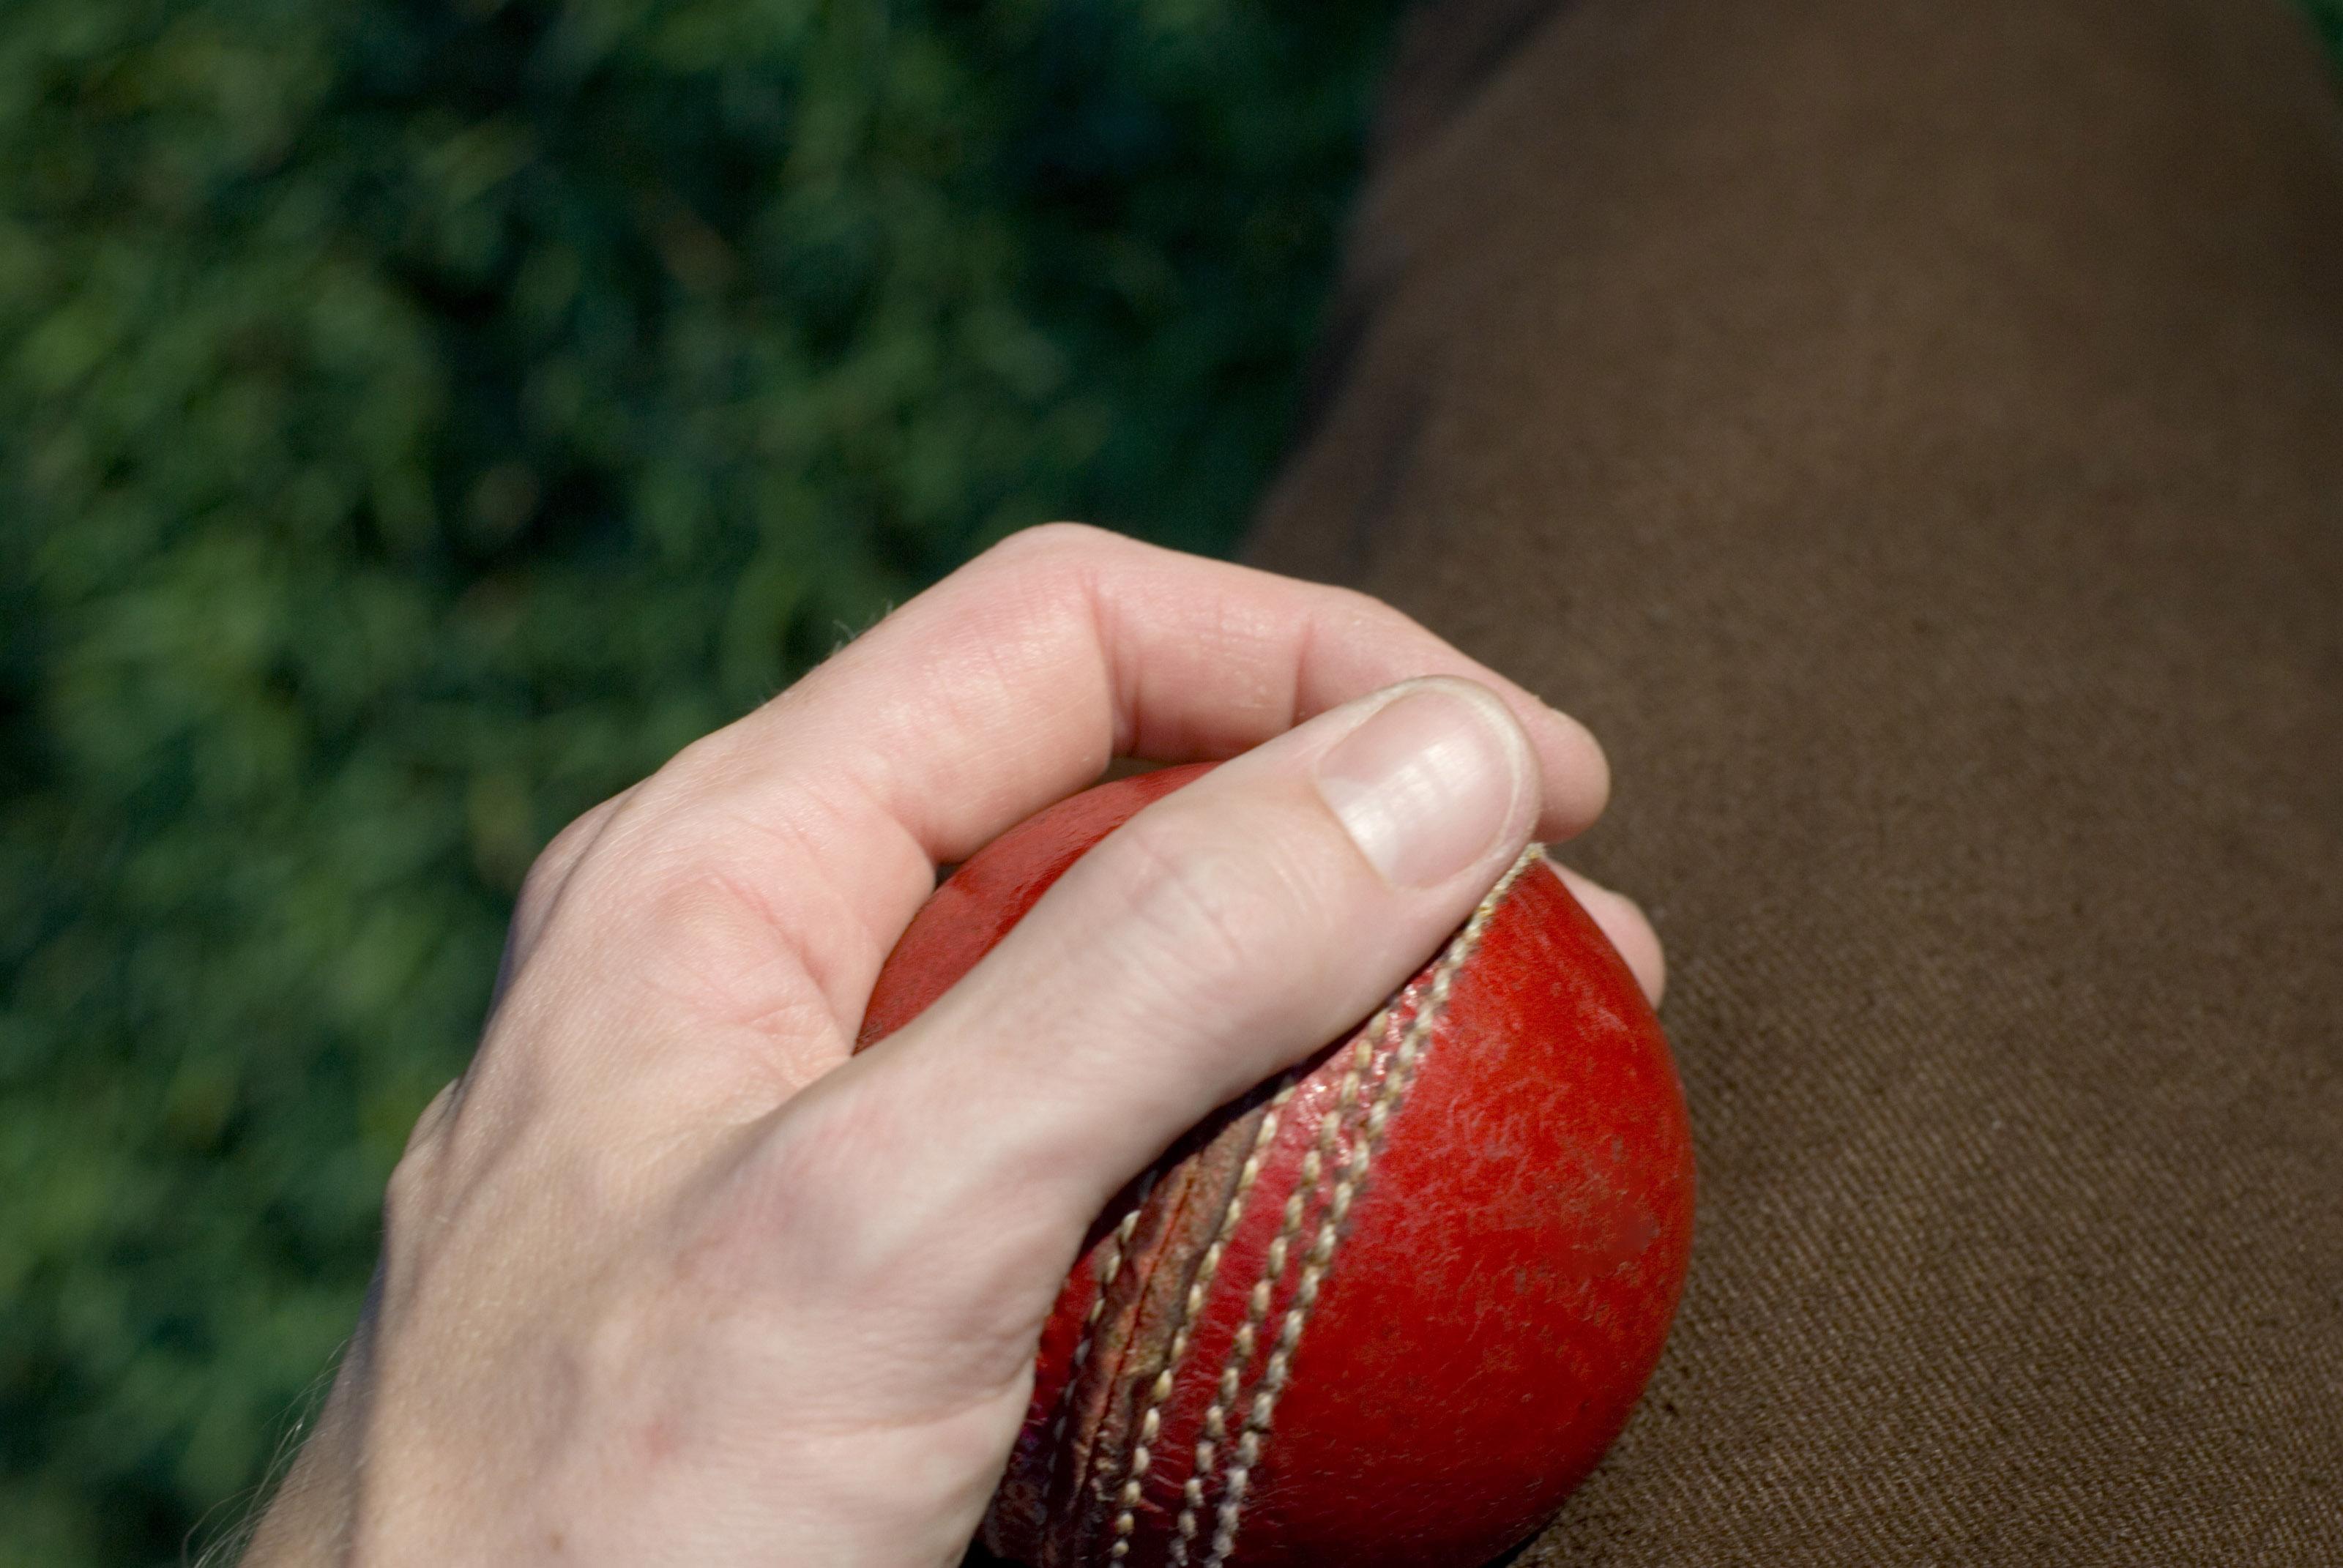 Best Bet On The 2020 IPL